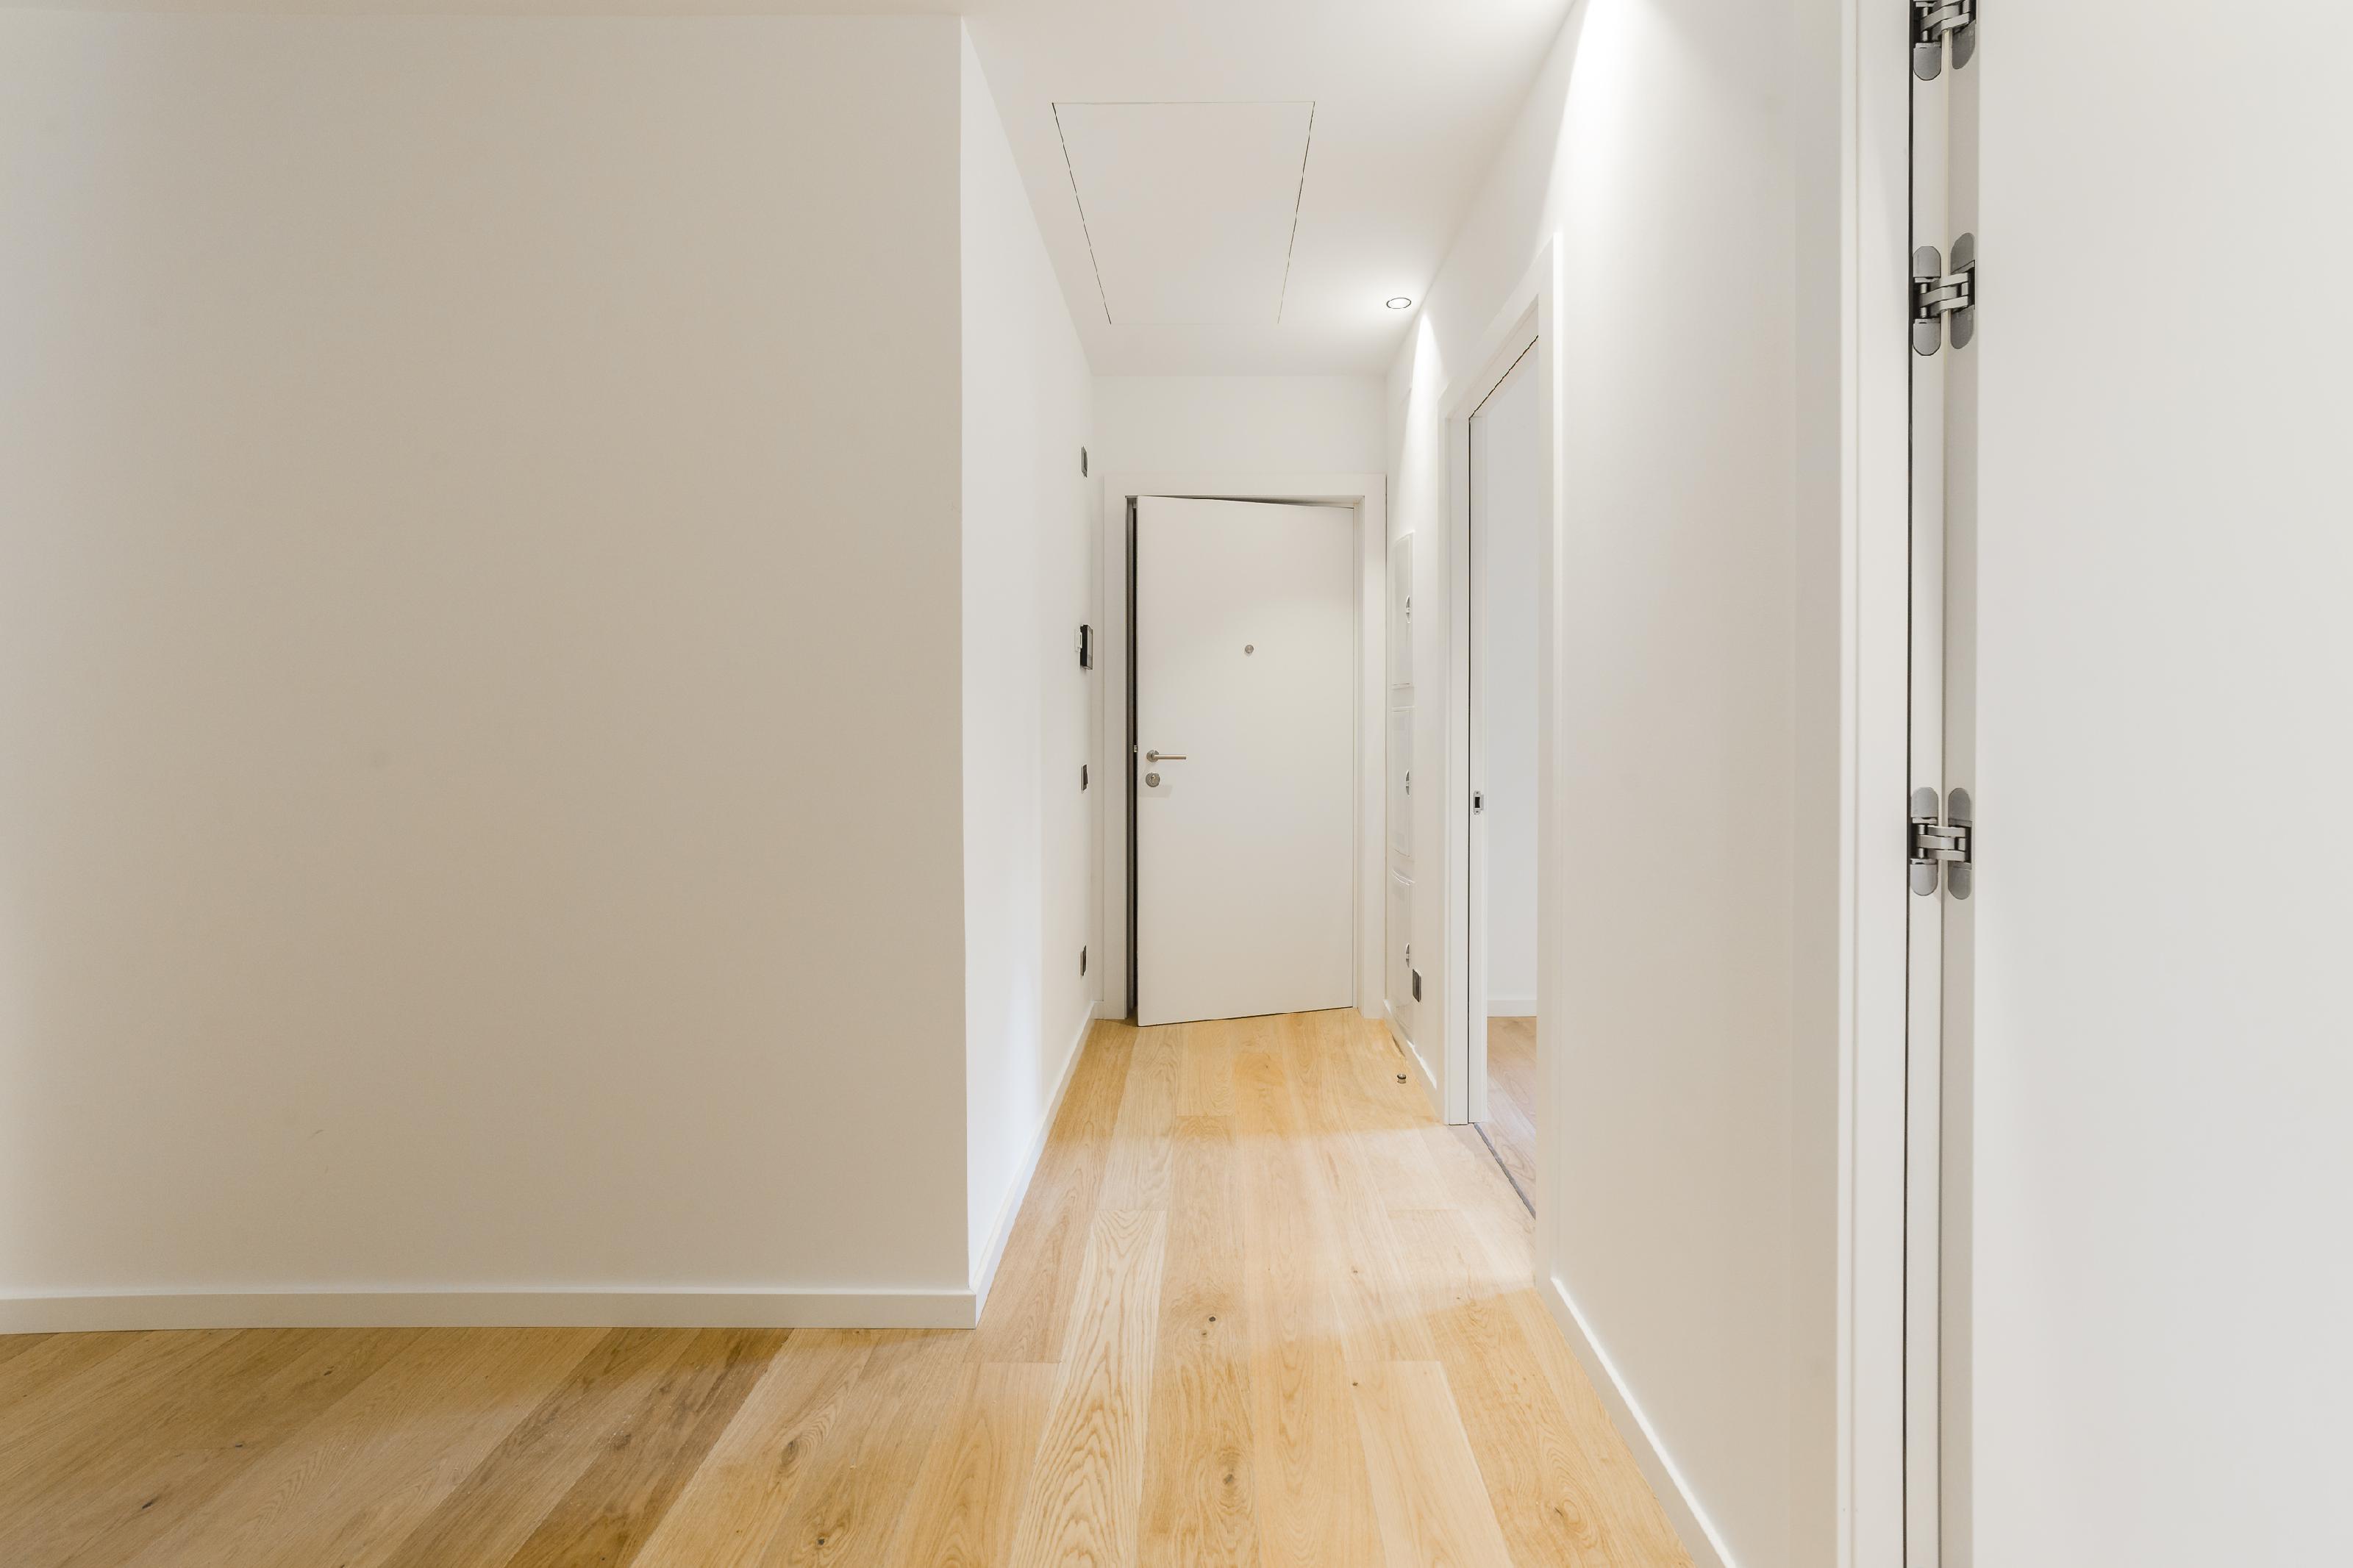 182456 Apartamento en venda en Eixample, Antiga Esquerre Eixample 14